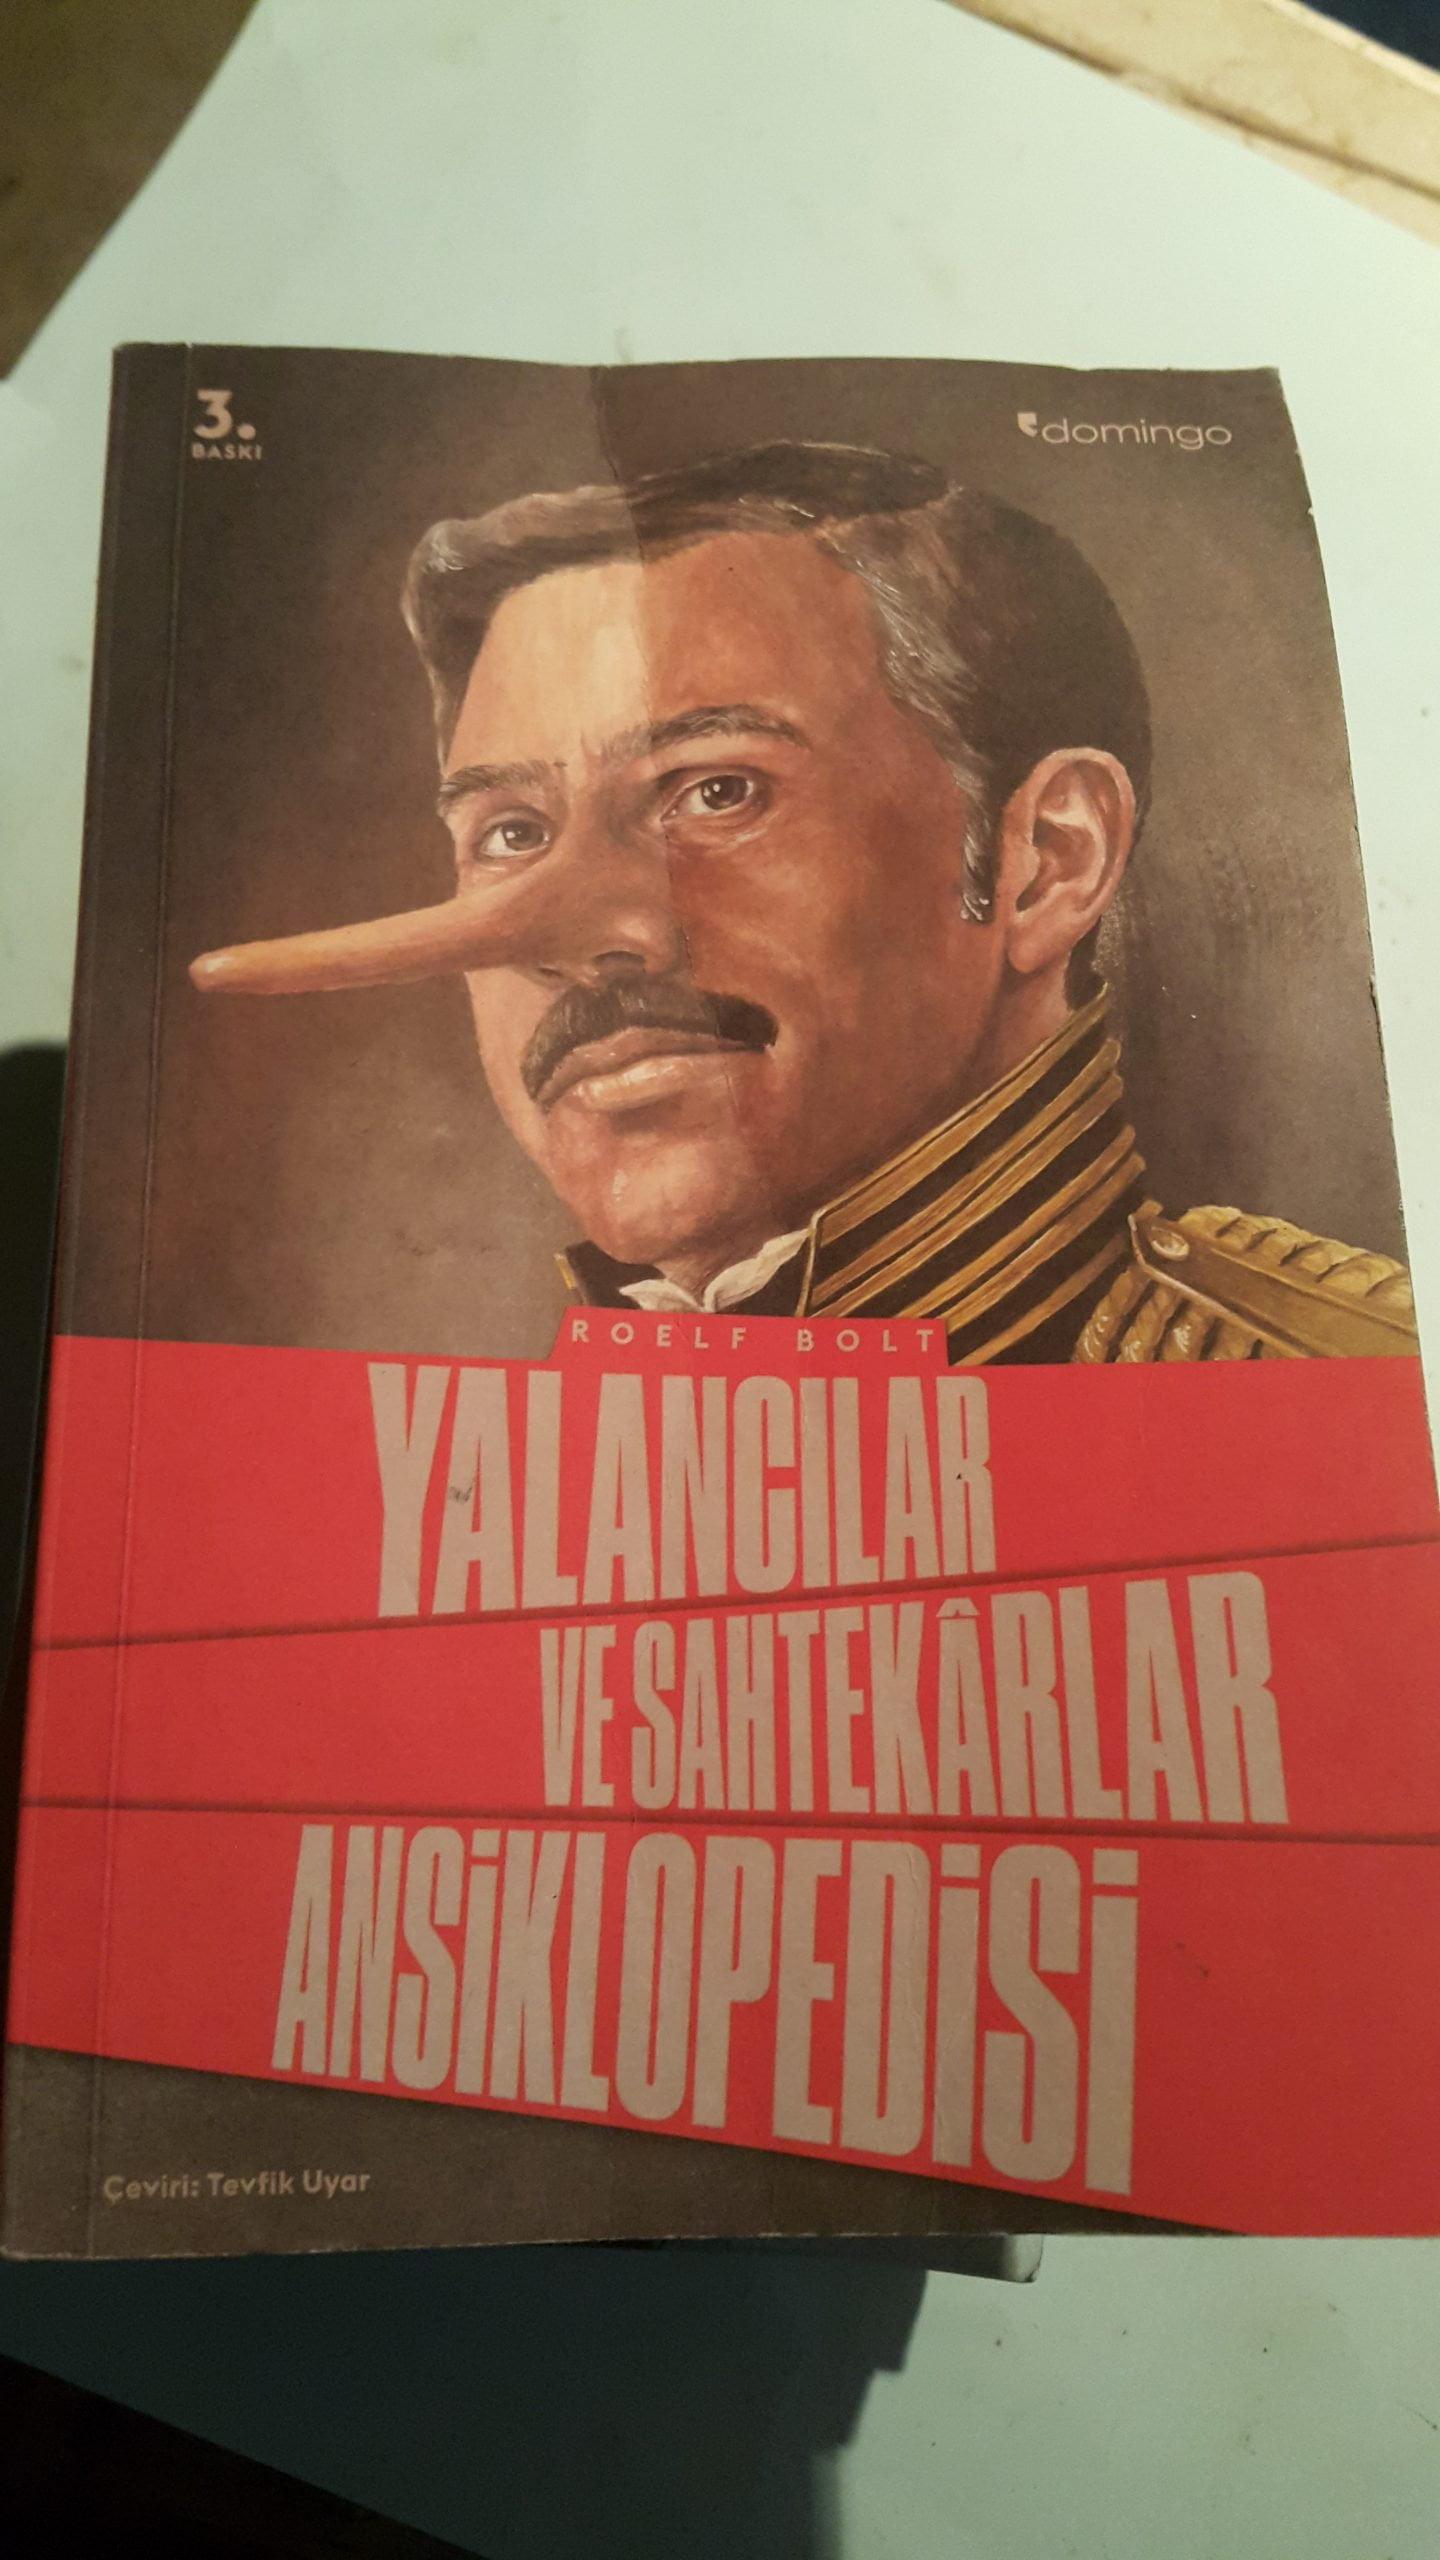 YALANCILAR VE SAHTEKARLAR ANSIKLOPEDİSİ/ROELF BOLT